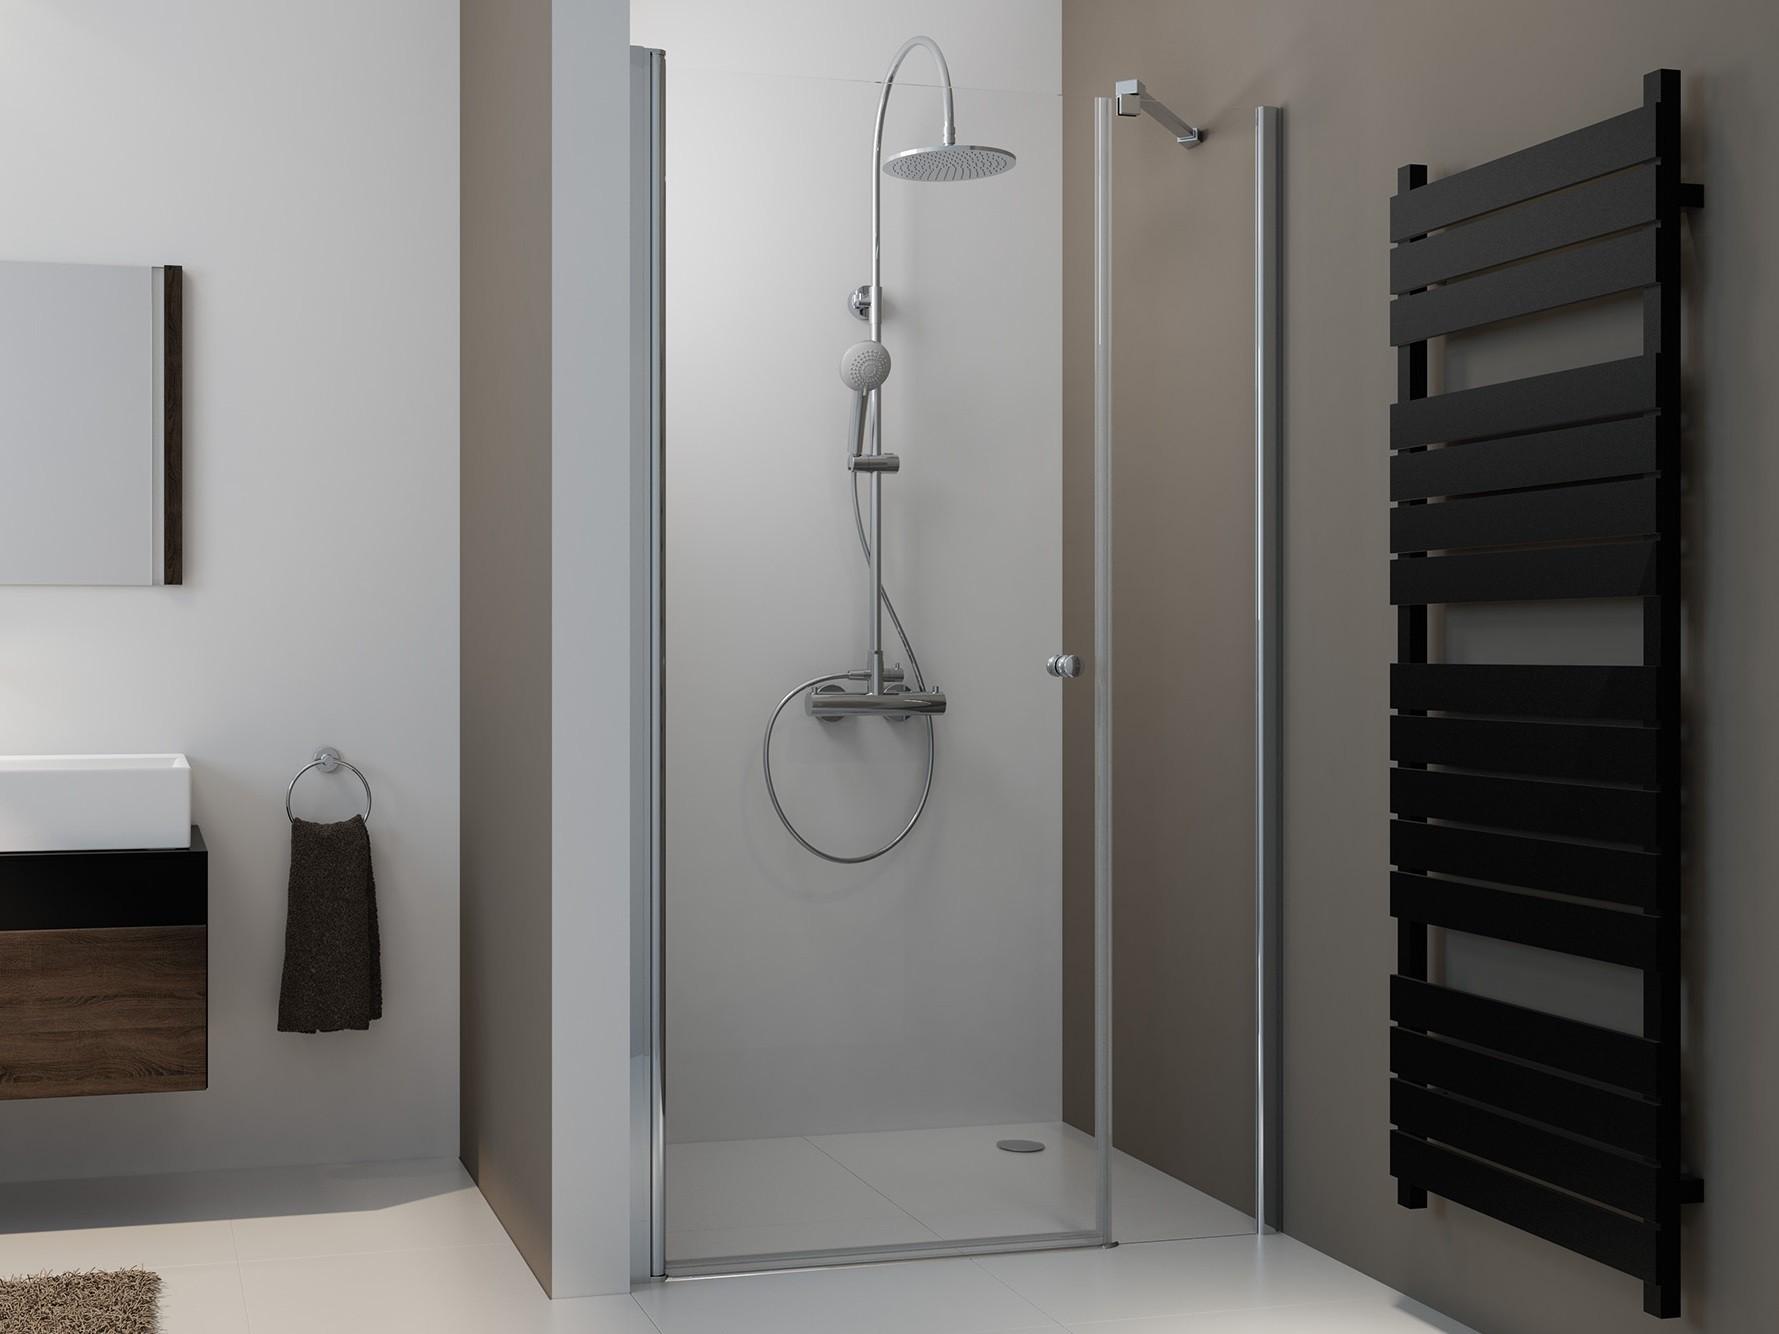 duscht r mit festfeld 140 x 220 cm duschabtrennung duscht ren duscht r 140 duscht r dreht r 140. Black Bedroom Furniture Sets. Home Design Ideas